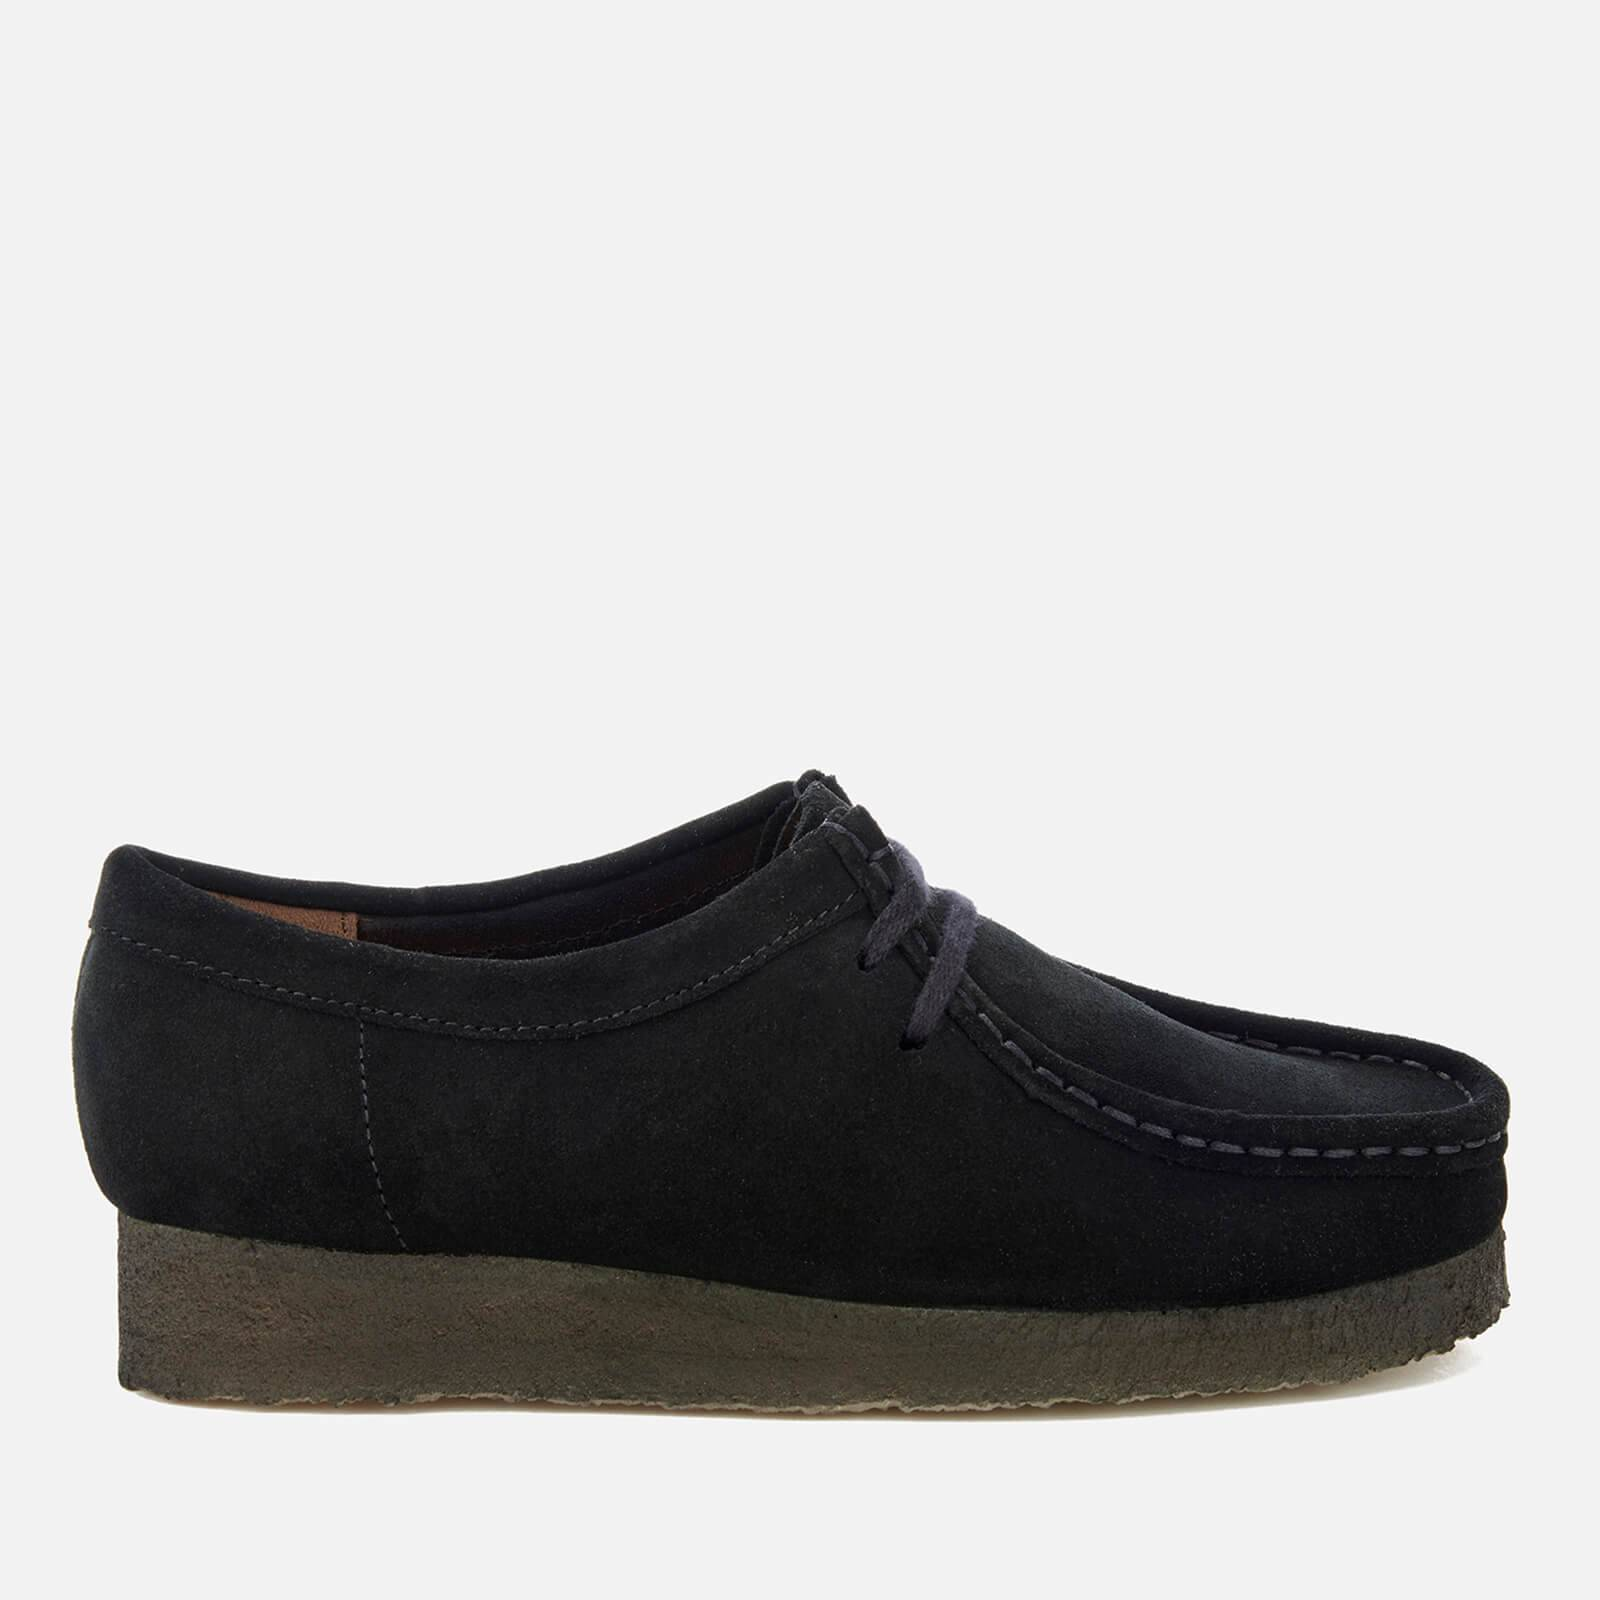 Clarks Originals Women's Wallabee Shoes - Black Suede - UK 5 - Black